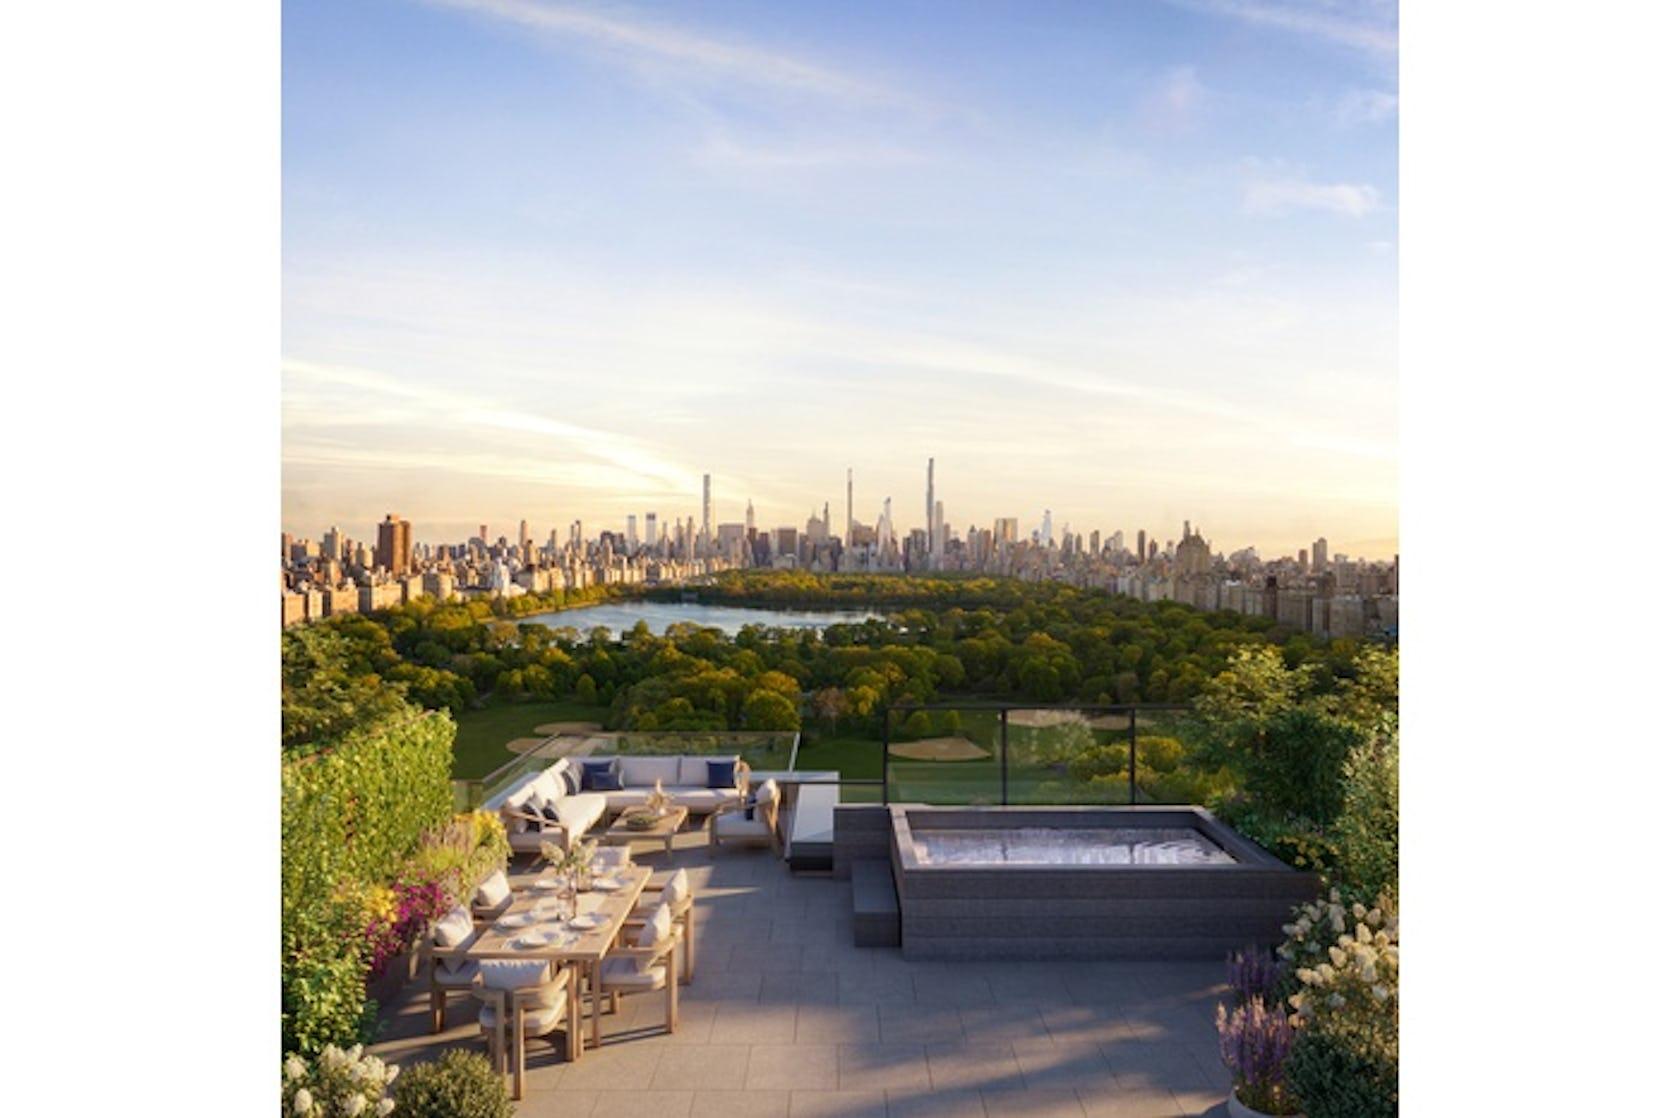 terrace bush plant vegetation outdoors furniture panoramic nature building patio